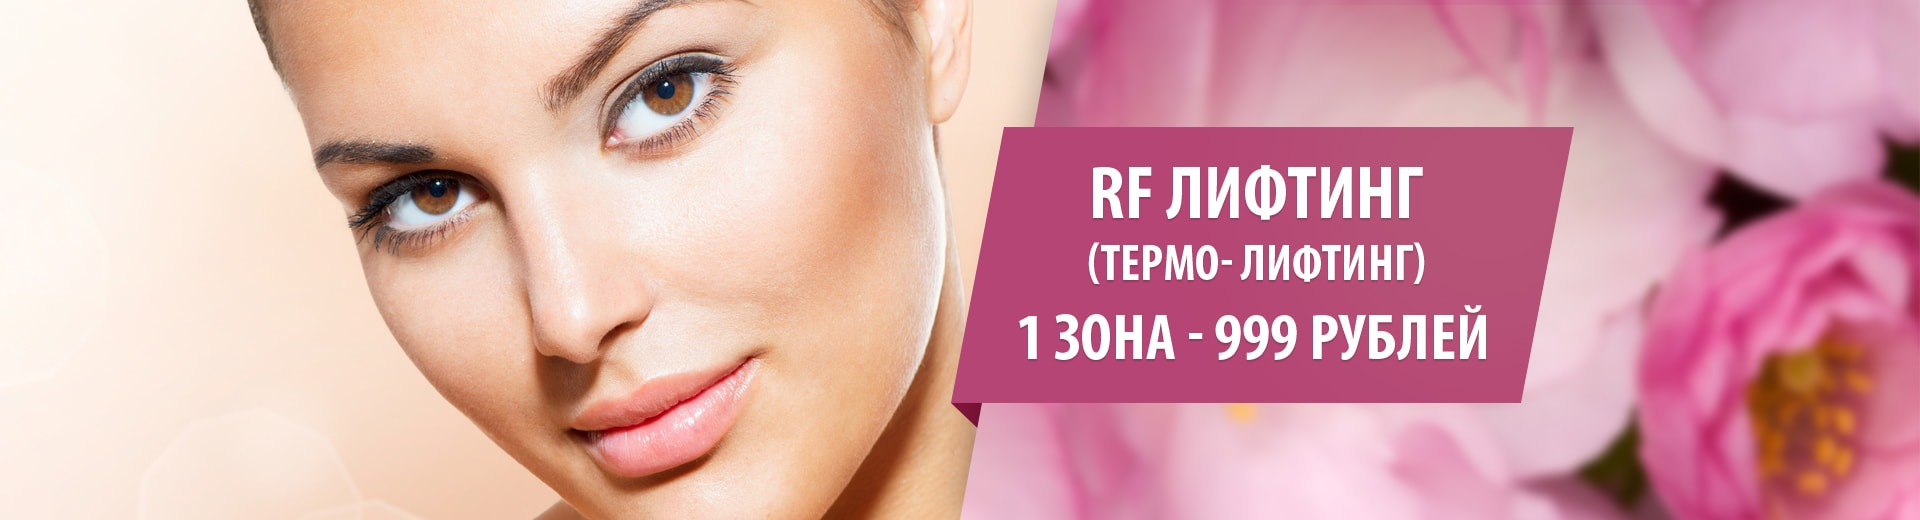 RF лифтинг 1зона - 999 рублей